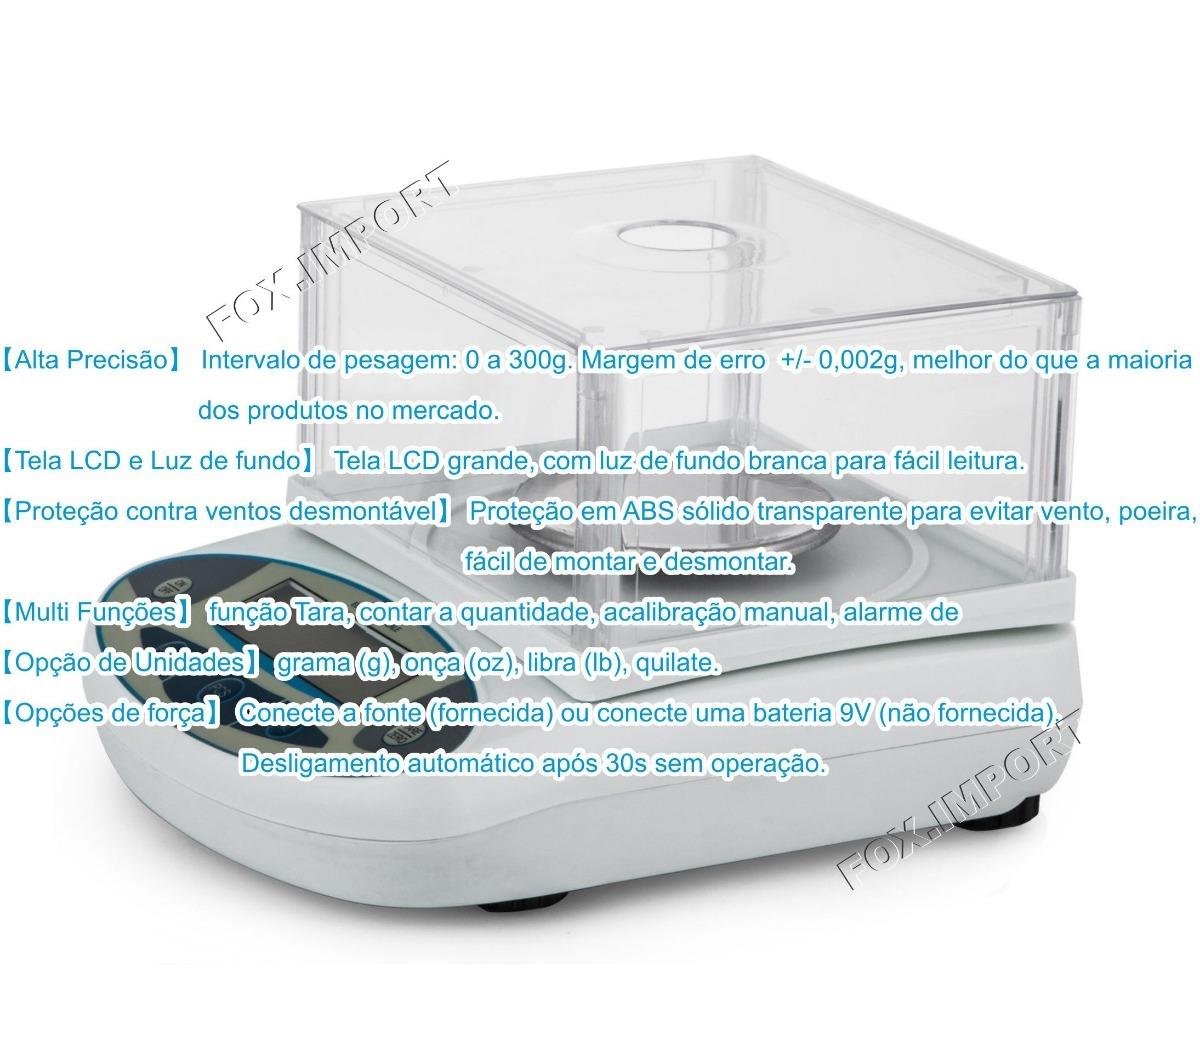 722c09b9c80 Balança Semi-analítica - Vevor 300g X 0,001g - R$ 1.999,00 em ...